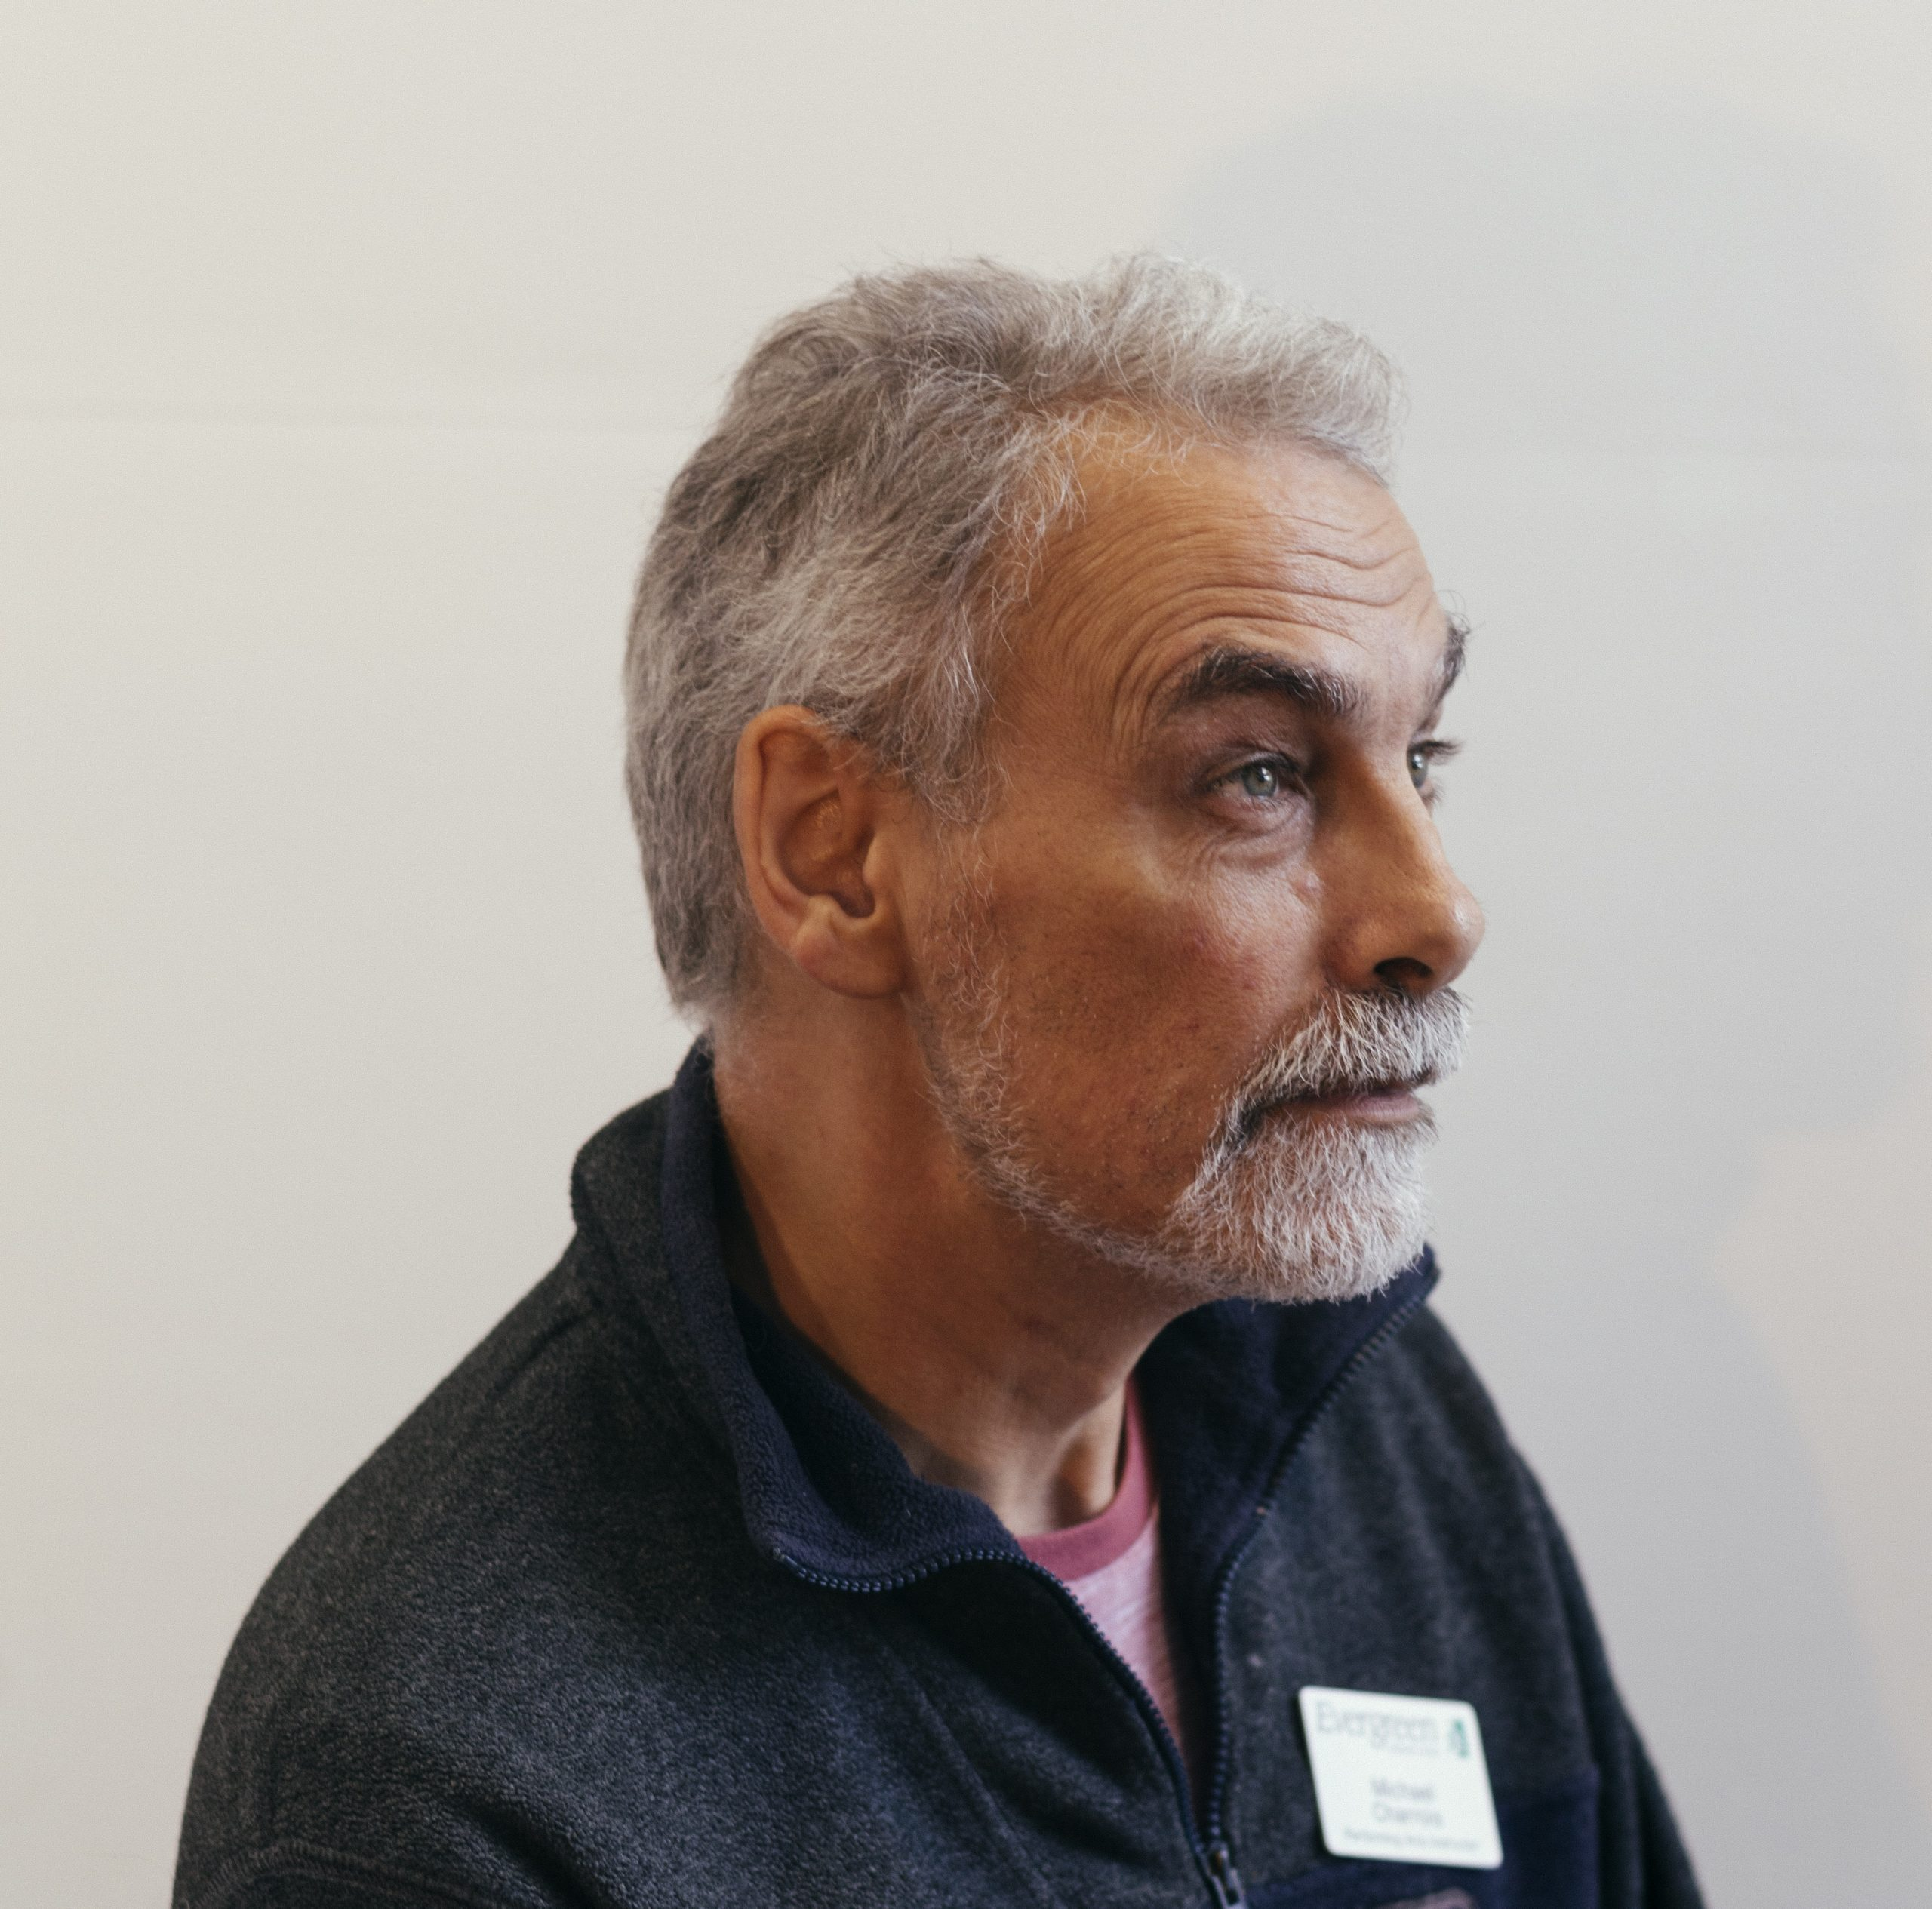 Michael Charrois